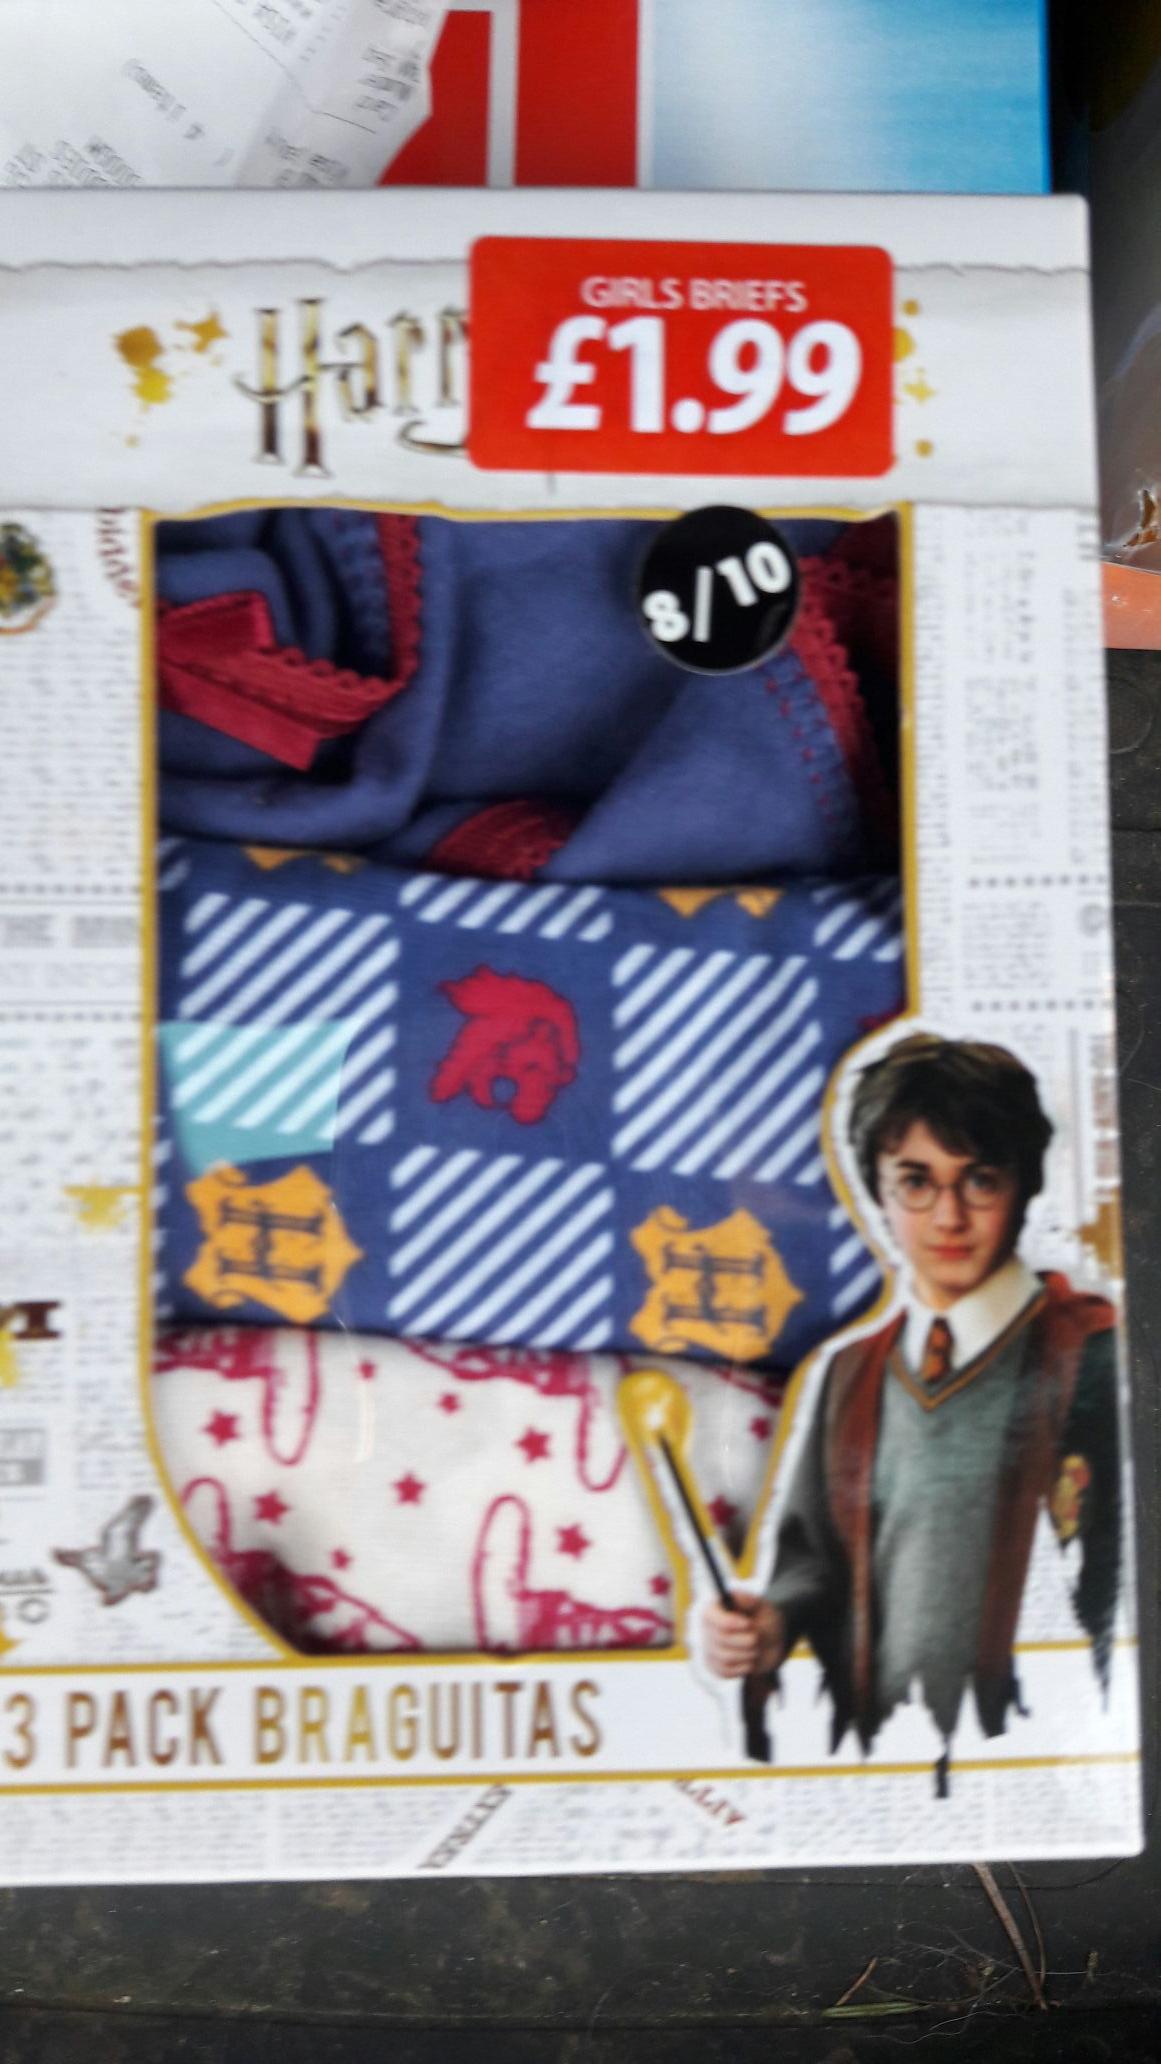 Harry Potter girl underpants £1.99 instore at poundstretcher